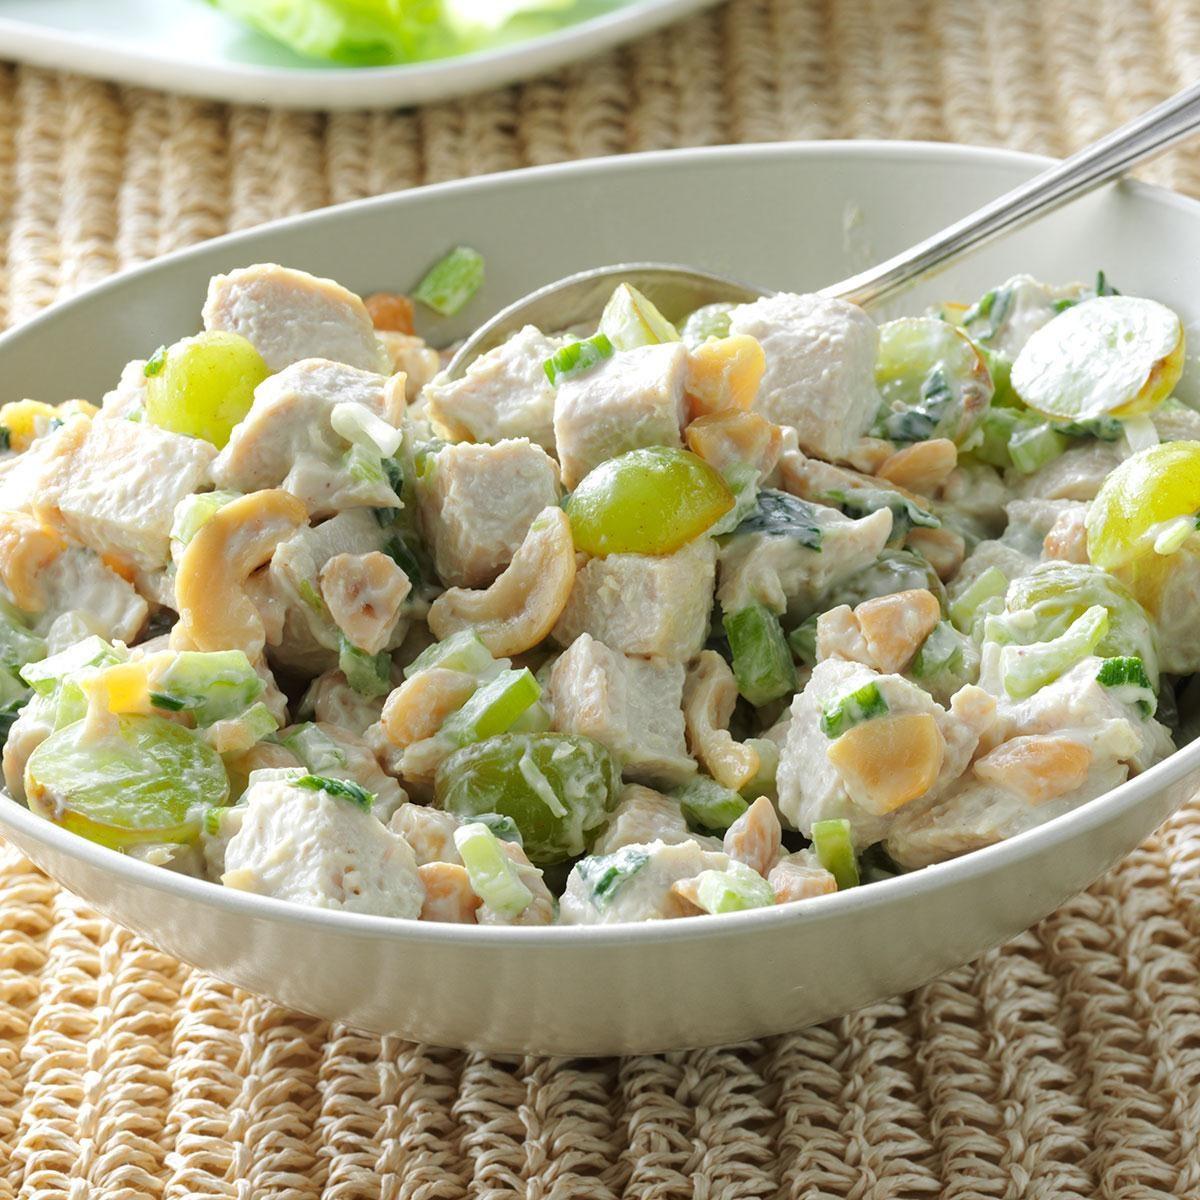 Turkey Salad With Grapes & Cashews Recipe